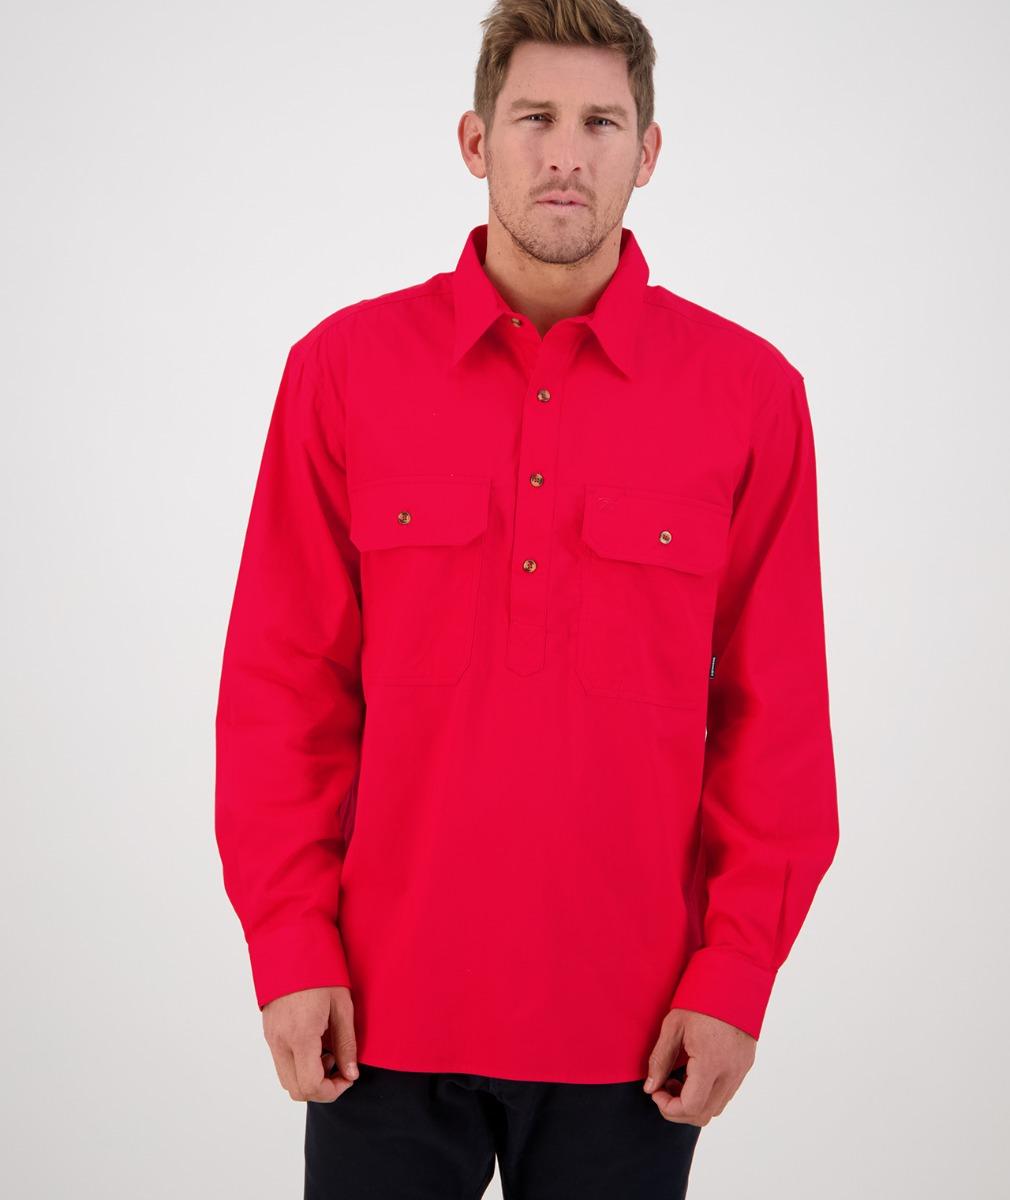 Swanndri Men's Bendigo Long Sleeve Work Shirt in Bright Red